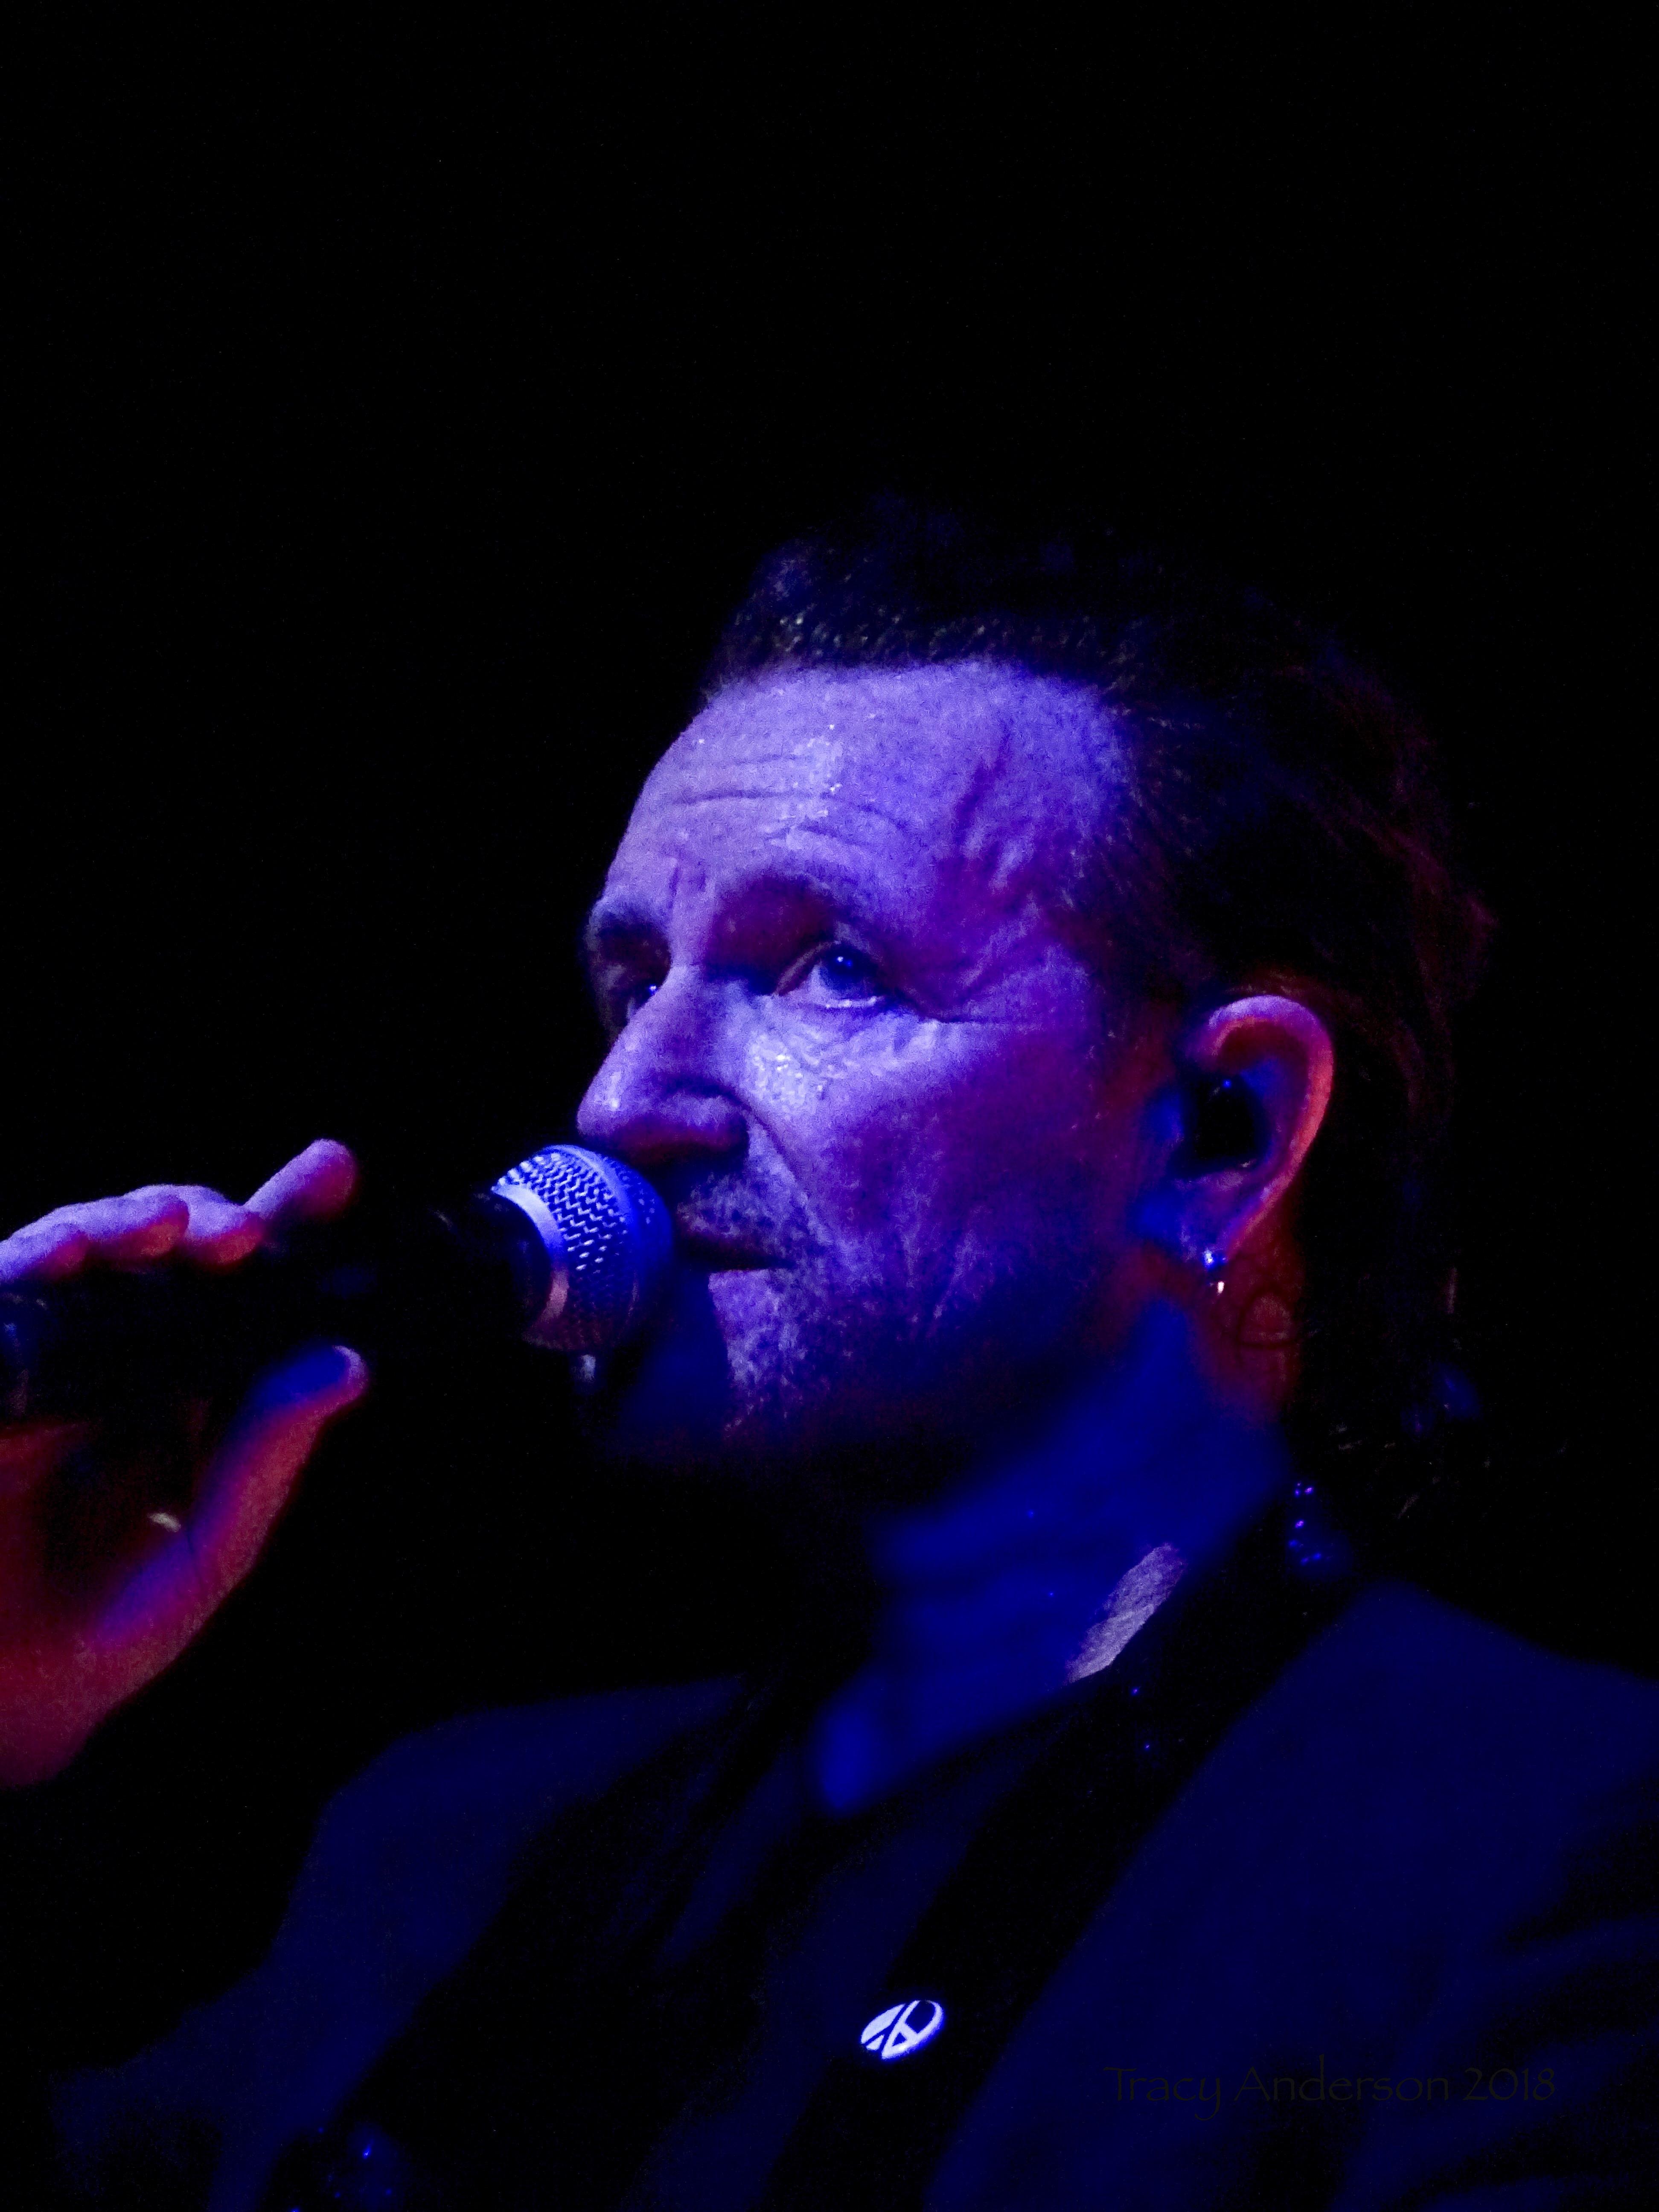 Bono Eyes U2 Dublin 4 3Arena Nov 10 2018